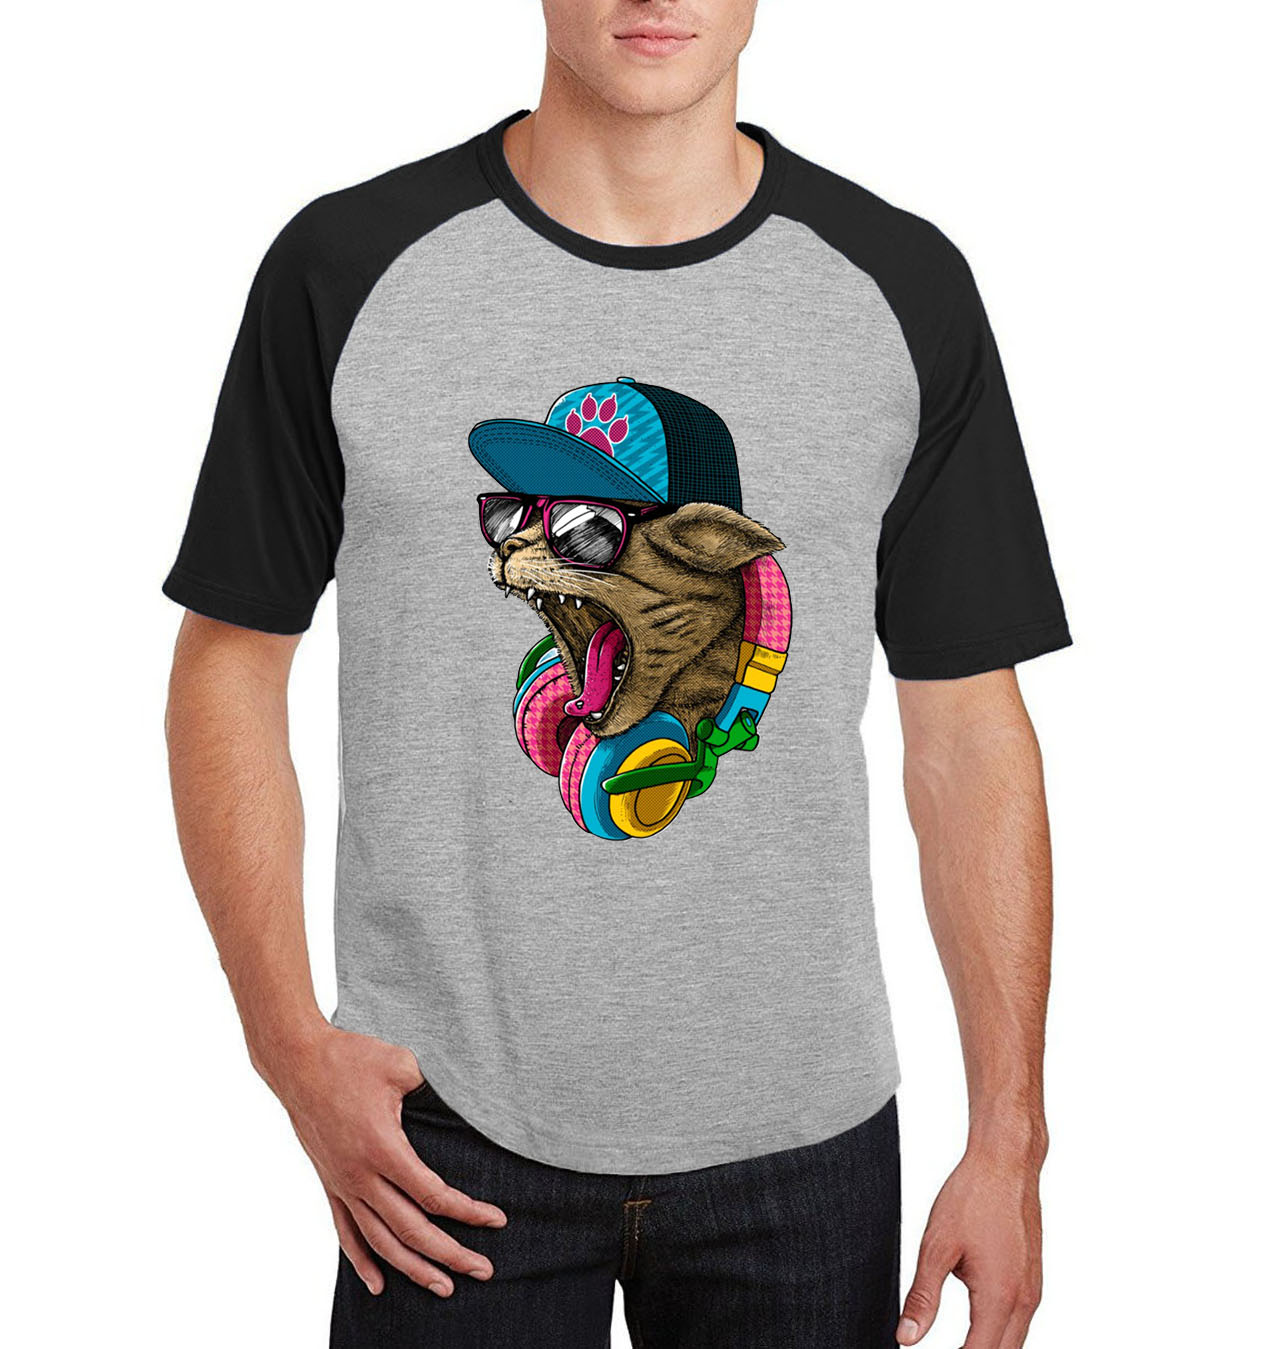 2017 Men's hot sale t shirts raglan short sleeve t-shirt mens summer kpop hip-hop camisetas o-neck DJ Cat casual Tee shirt homme